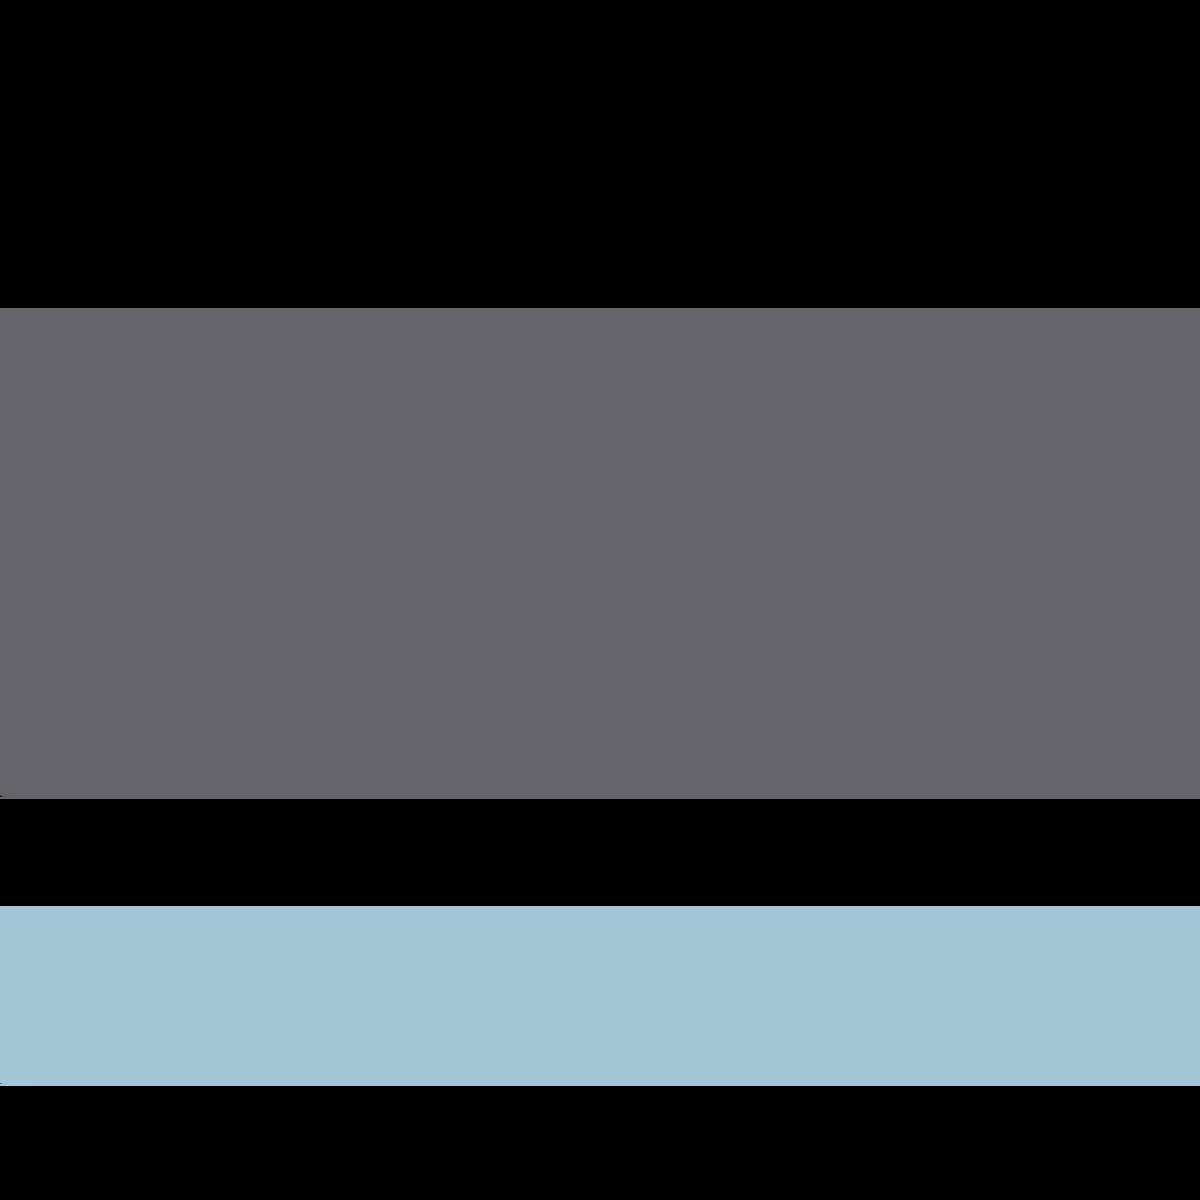 South Park Apartments Omaha: Park Place Apartments In Omaha, NE